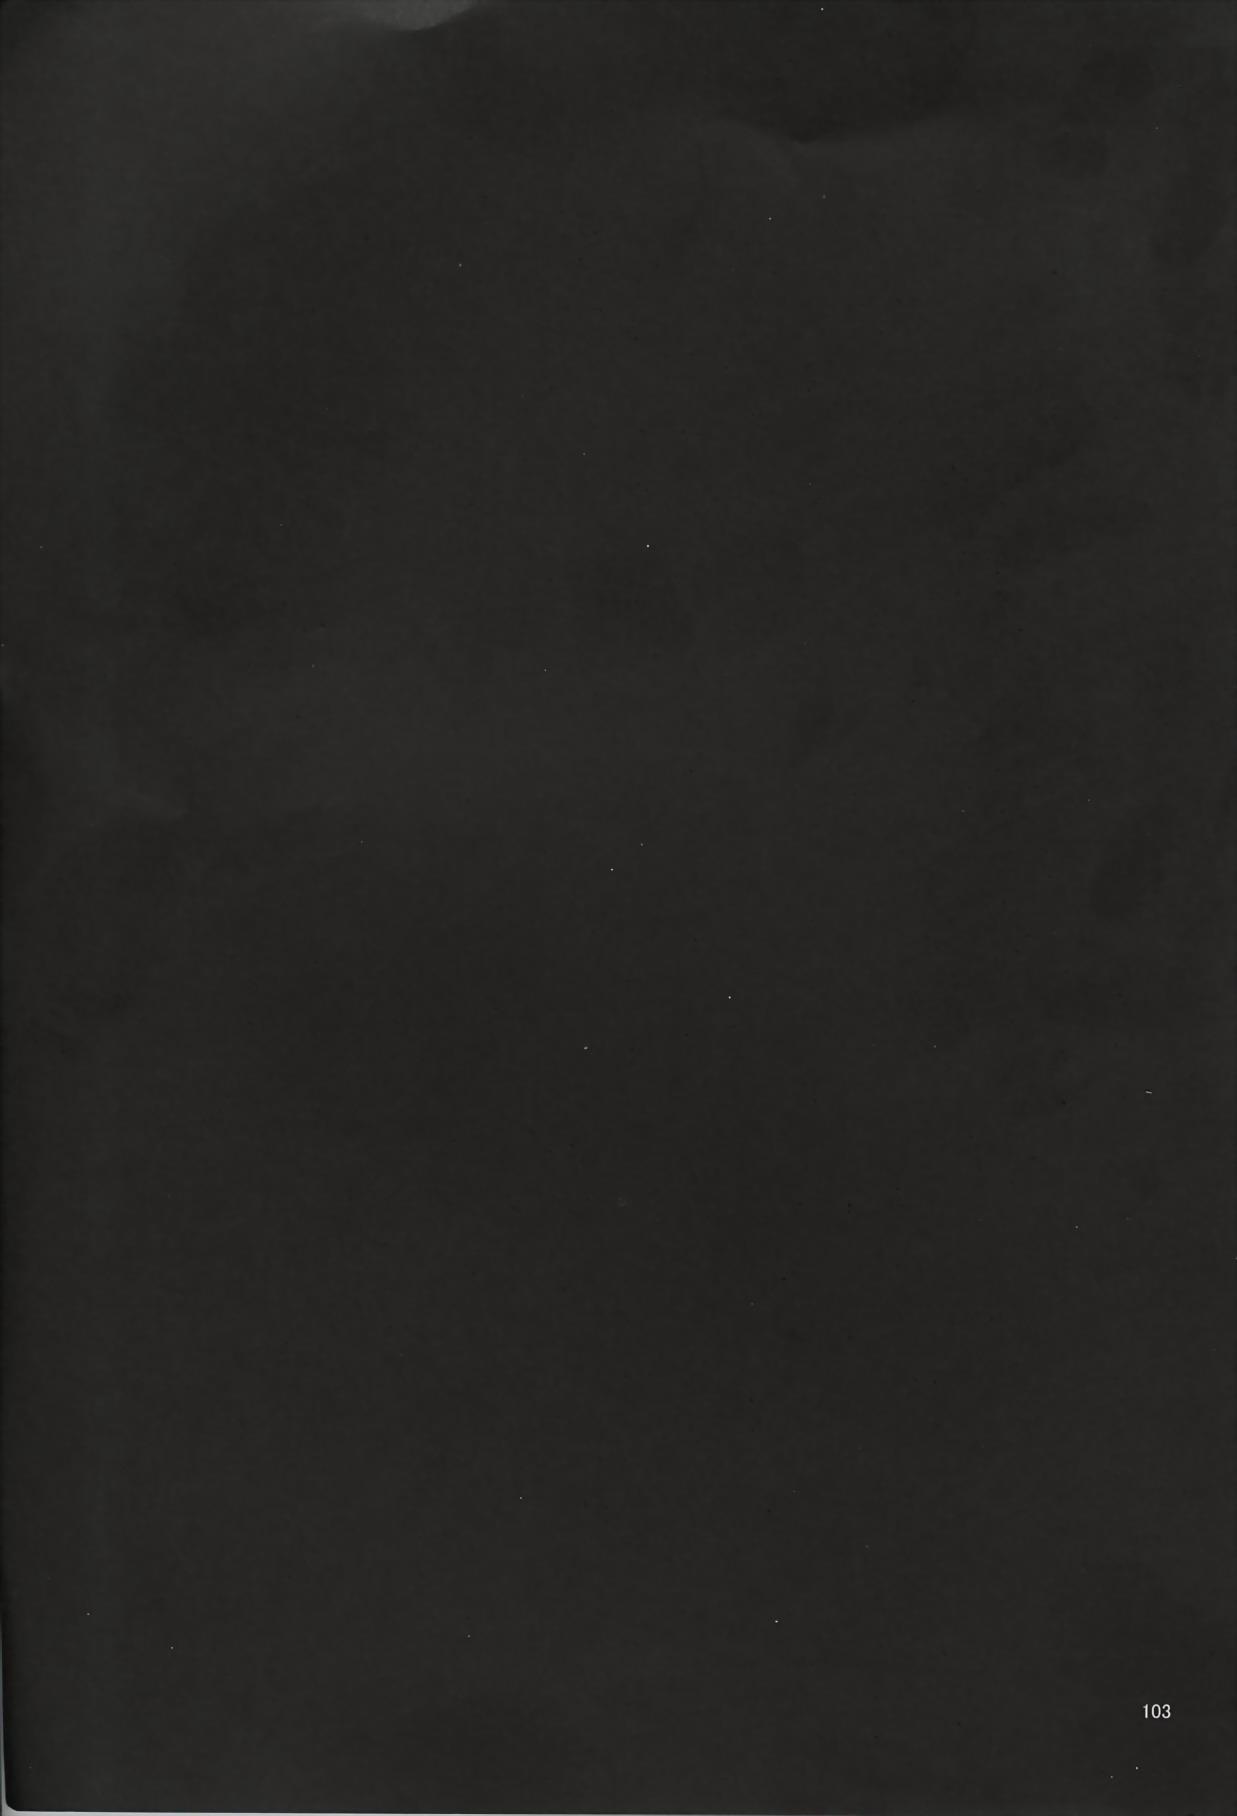 NORI-HARU COMPLETE 1 103